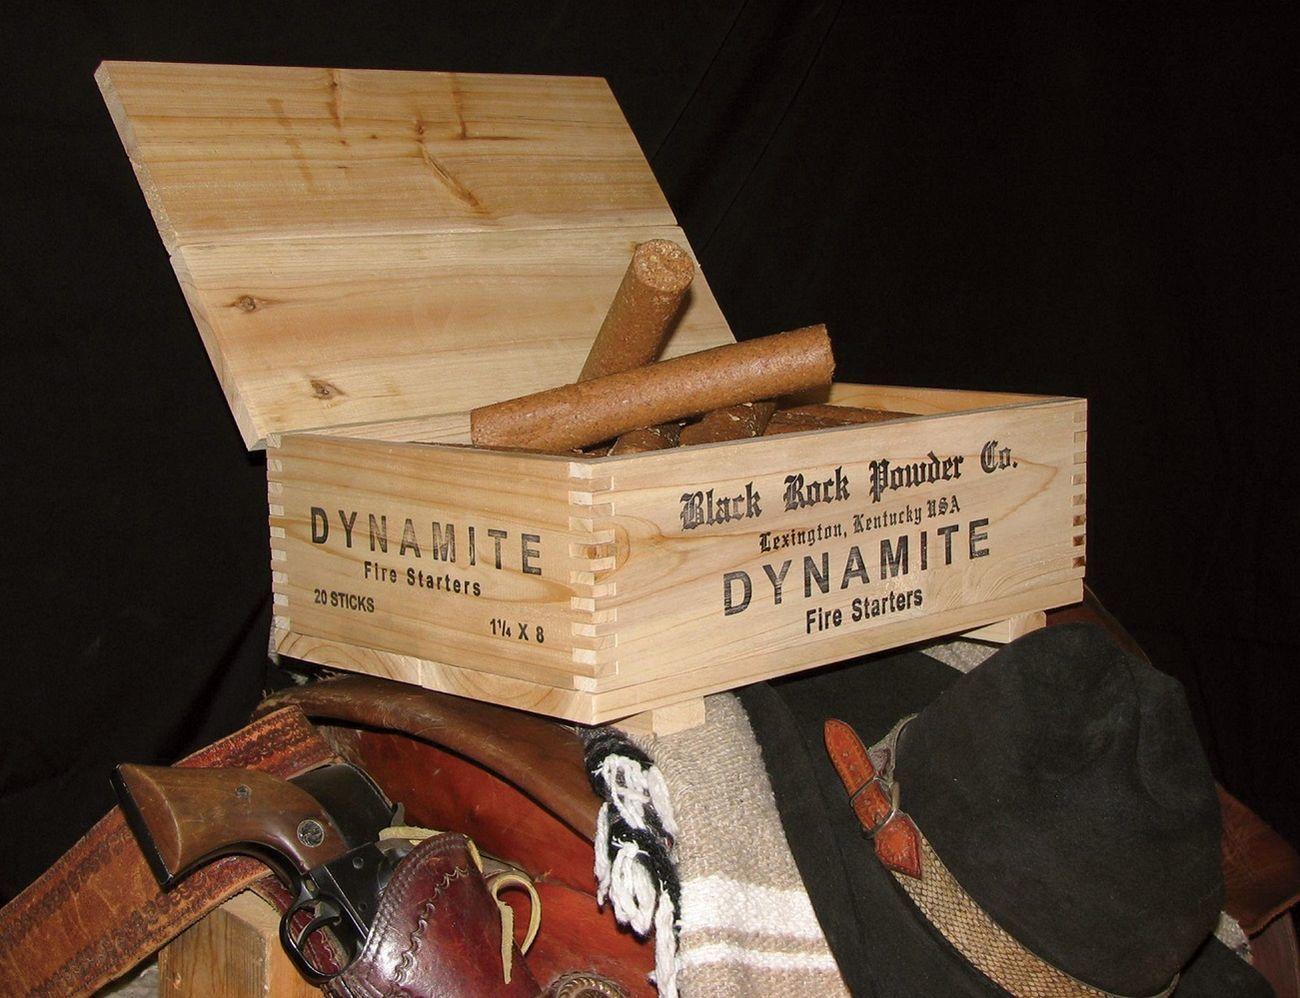 Dynamite Fire Starter Box